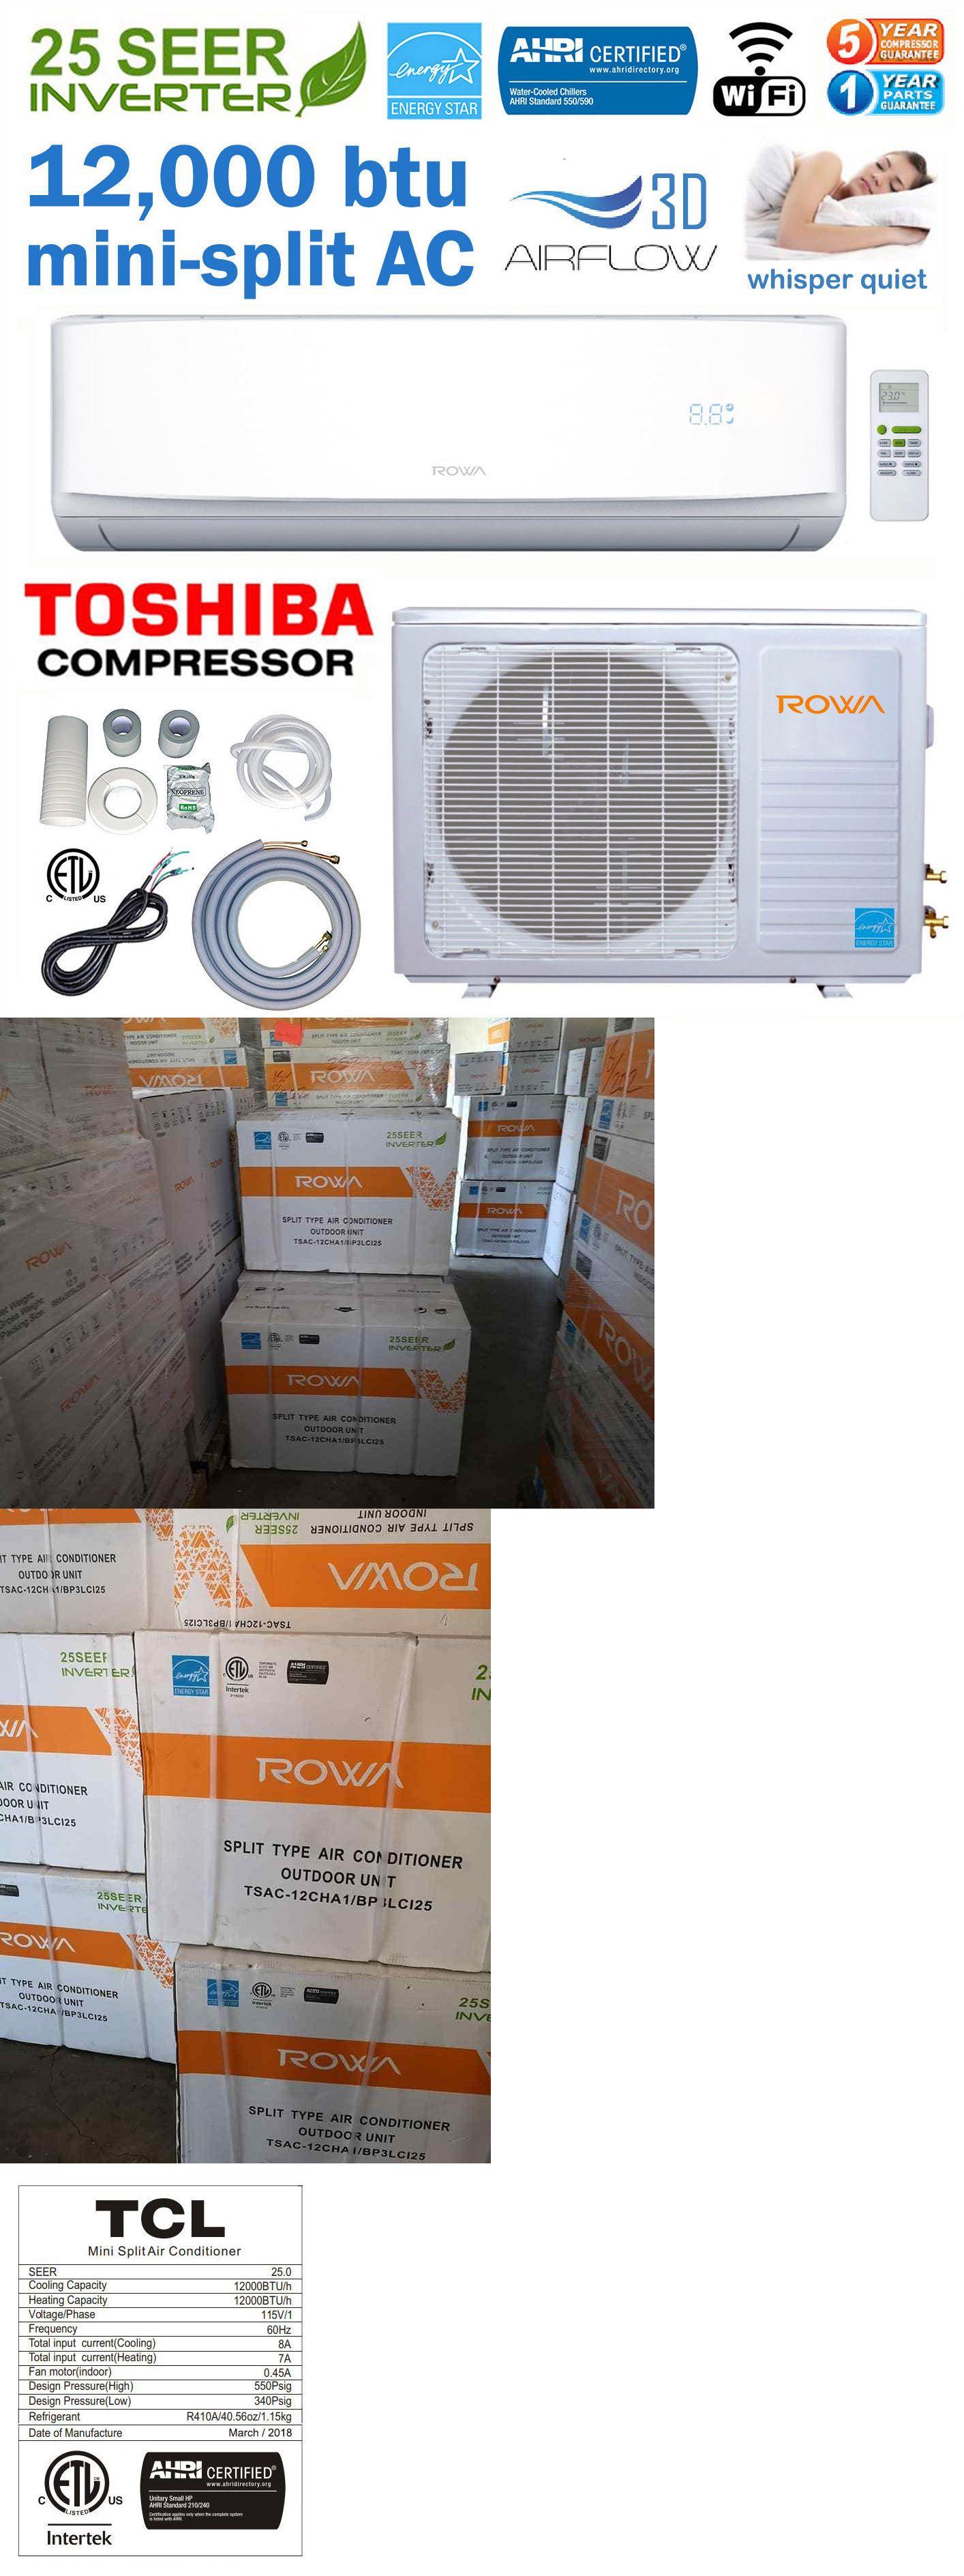 25 Seer 12000 Btu Ductless Mini Split Ac Air Conditioner Energy Star 110v Wifi Ductless Mini Split Mini Split Ac Central Air Conditioners